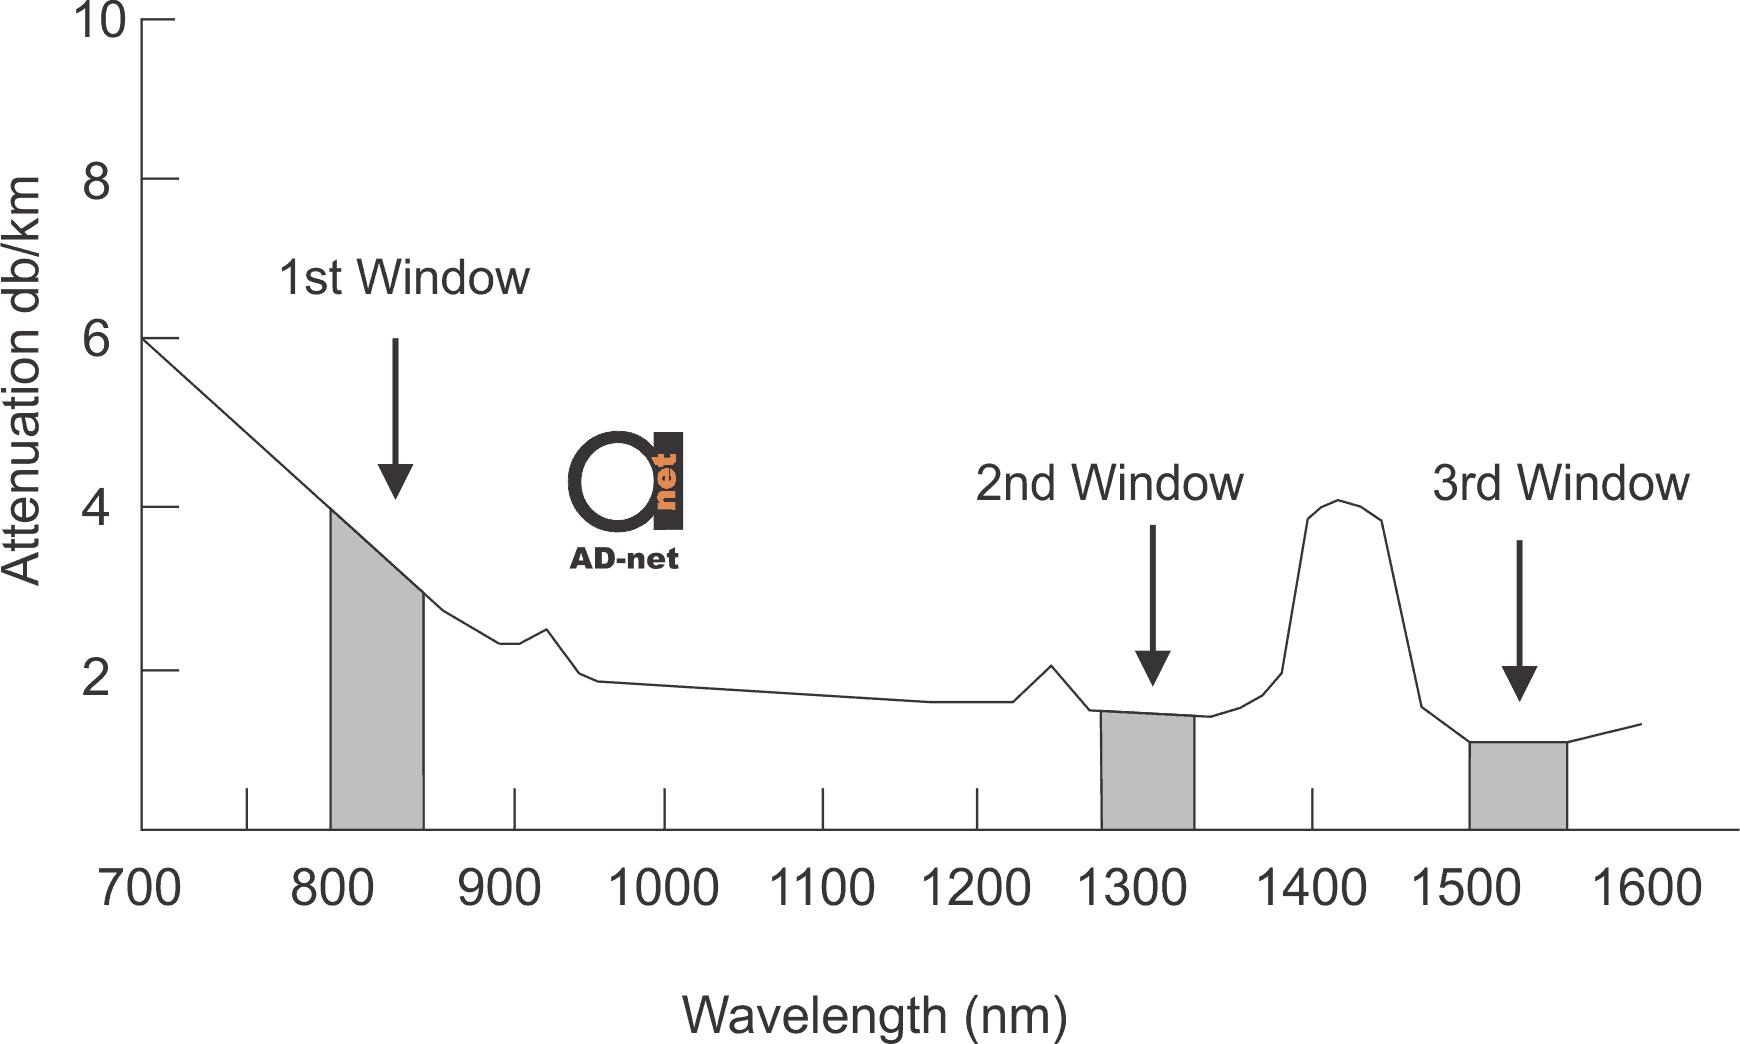 Optical Transmission Wavelengths Or Windows